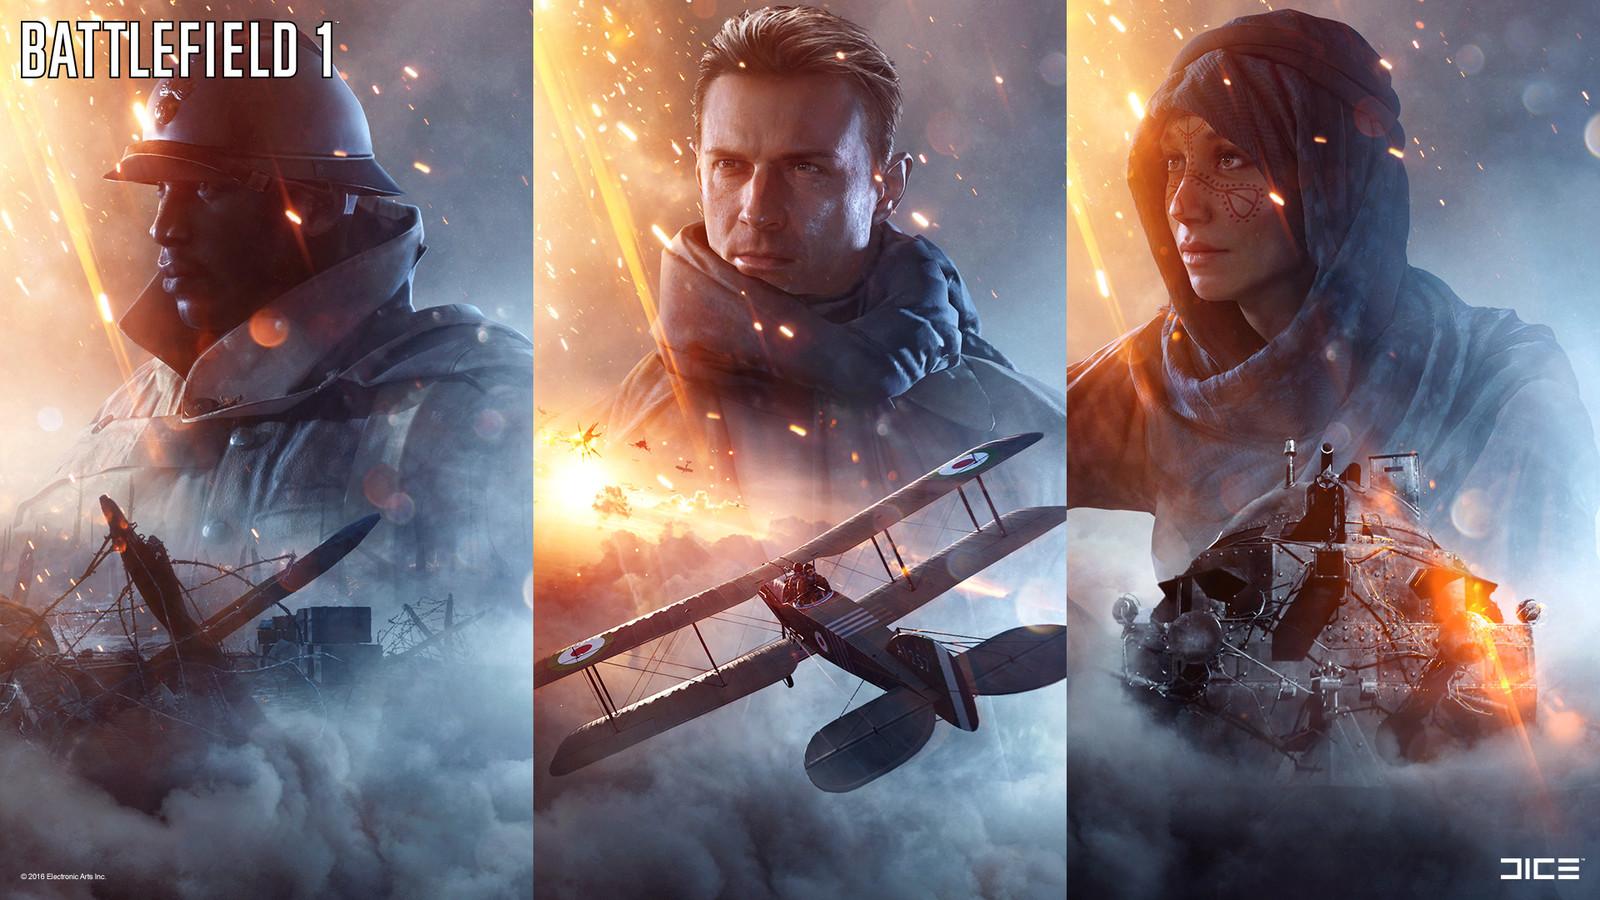 """Battlefield 1"" - War Stories Key Art - 01 / Collaboration with Robert Sammelin & the DICE Character team"